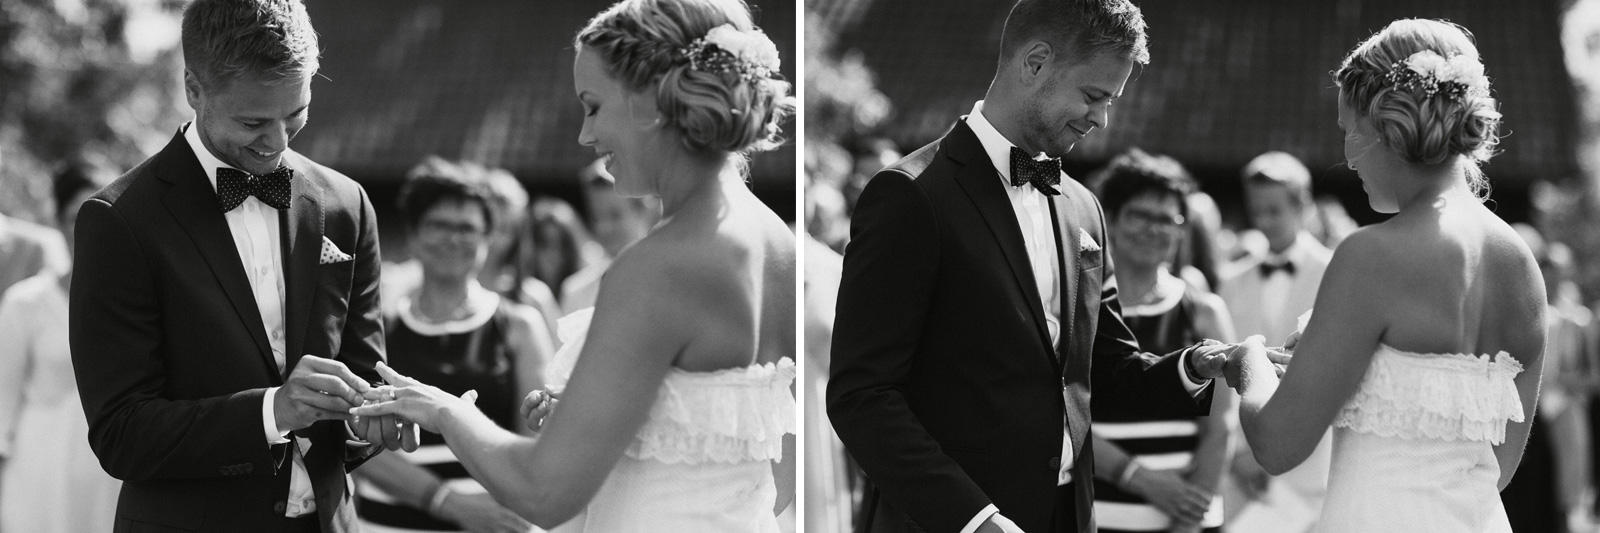 gotland-wedding-photographer